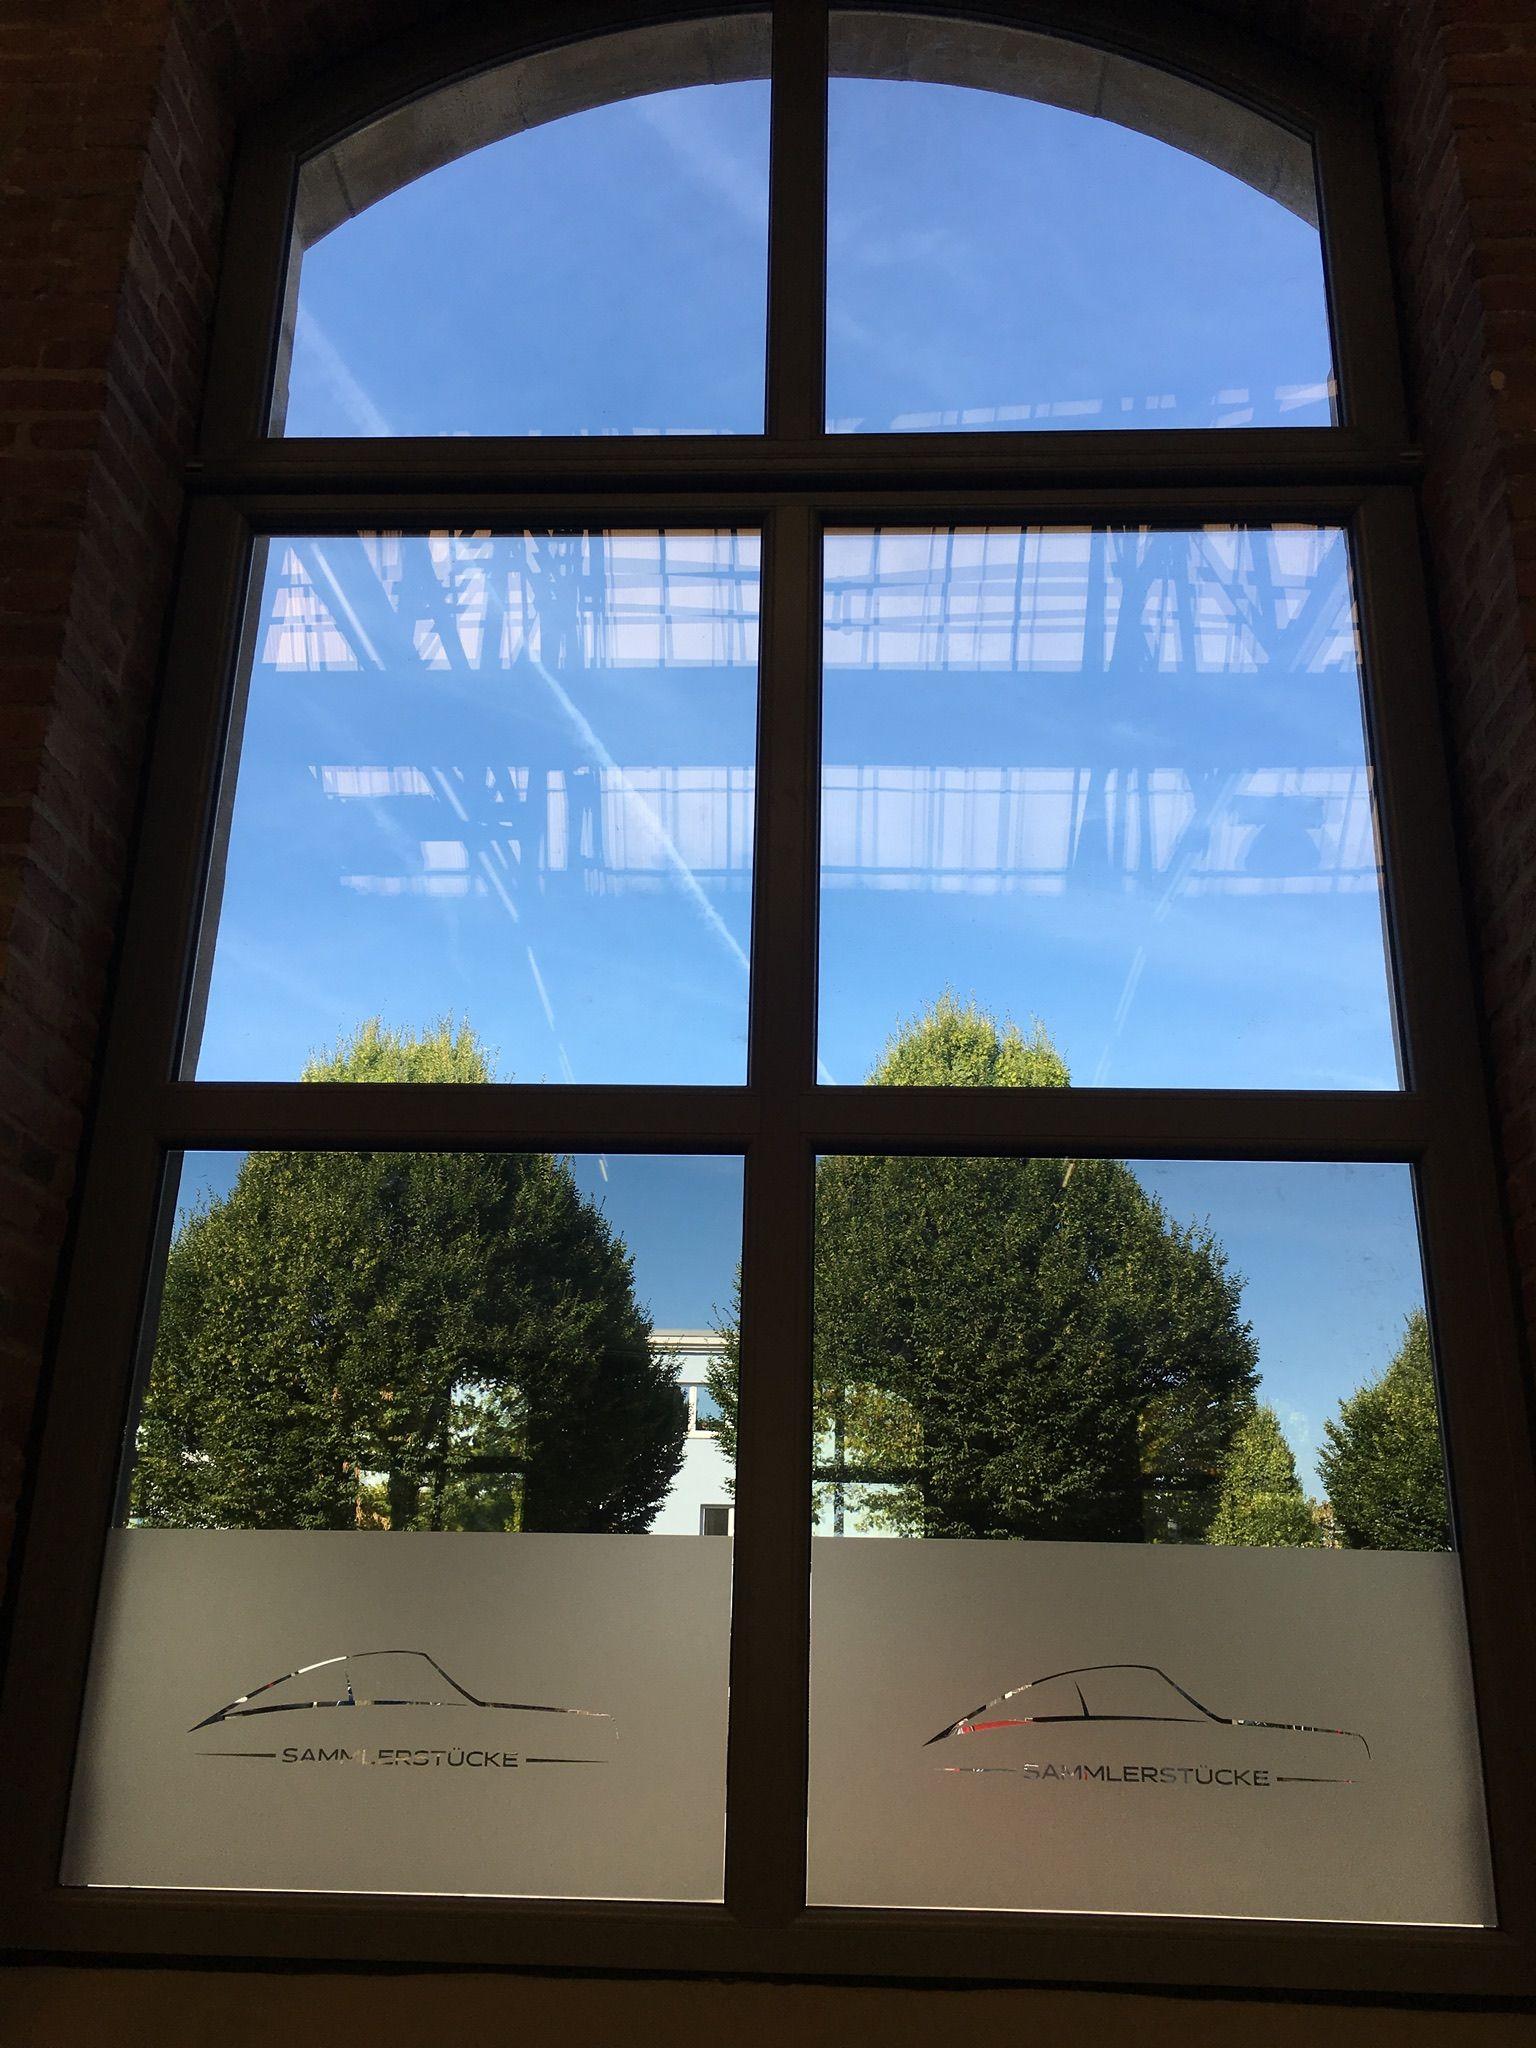 Full Size of Sonnenschutzfolie Fenster Sonnenschutzfolien Transparent Hitzeschutzfolien Mit Spiegeleffekt Rollo Velux Jalousien Innen Sichtschutz Für De Wärmeschutzfolie Fenster Sonnenschutzfolie Fenster